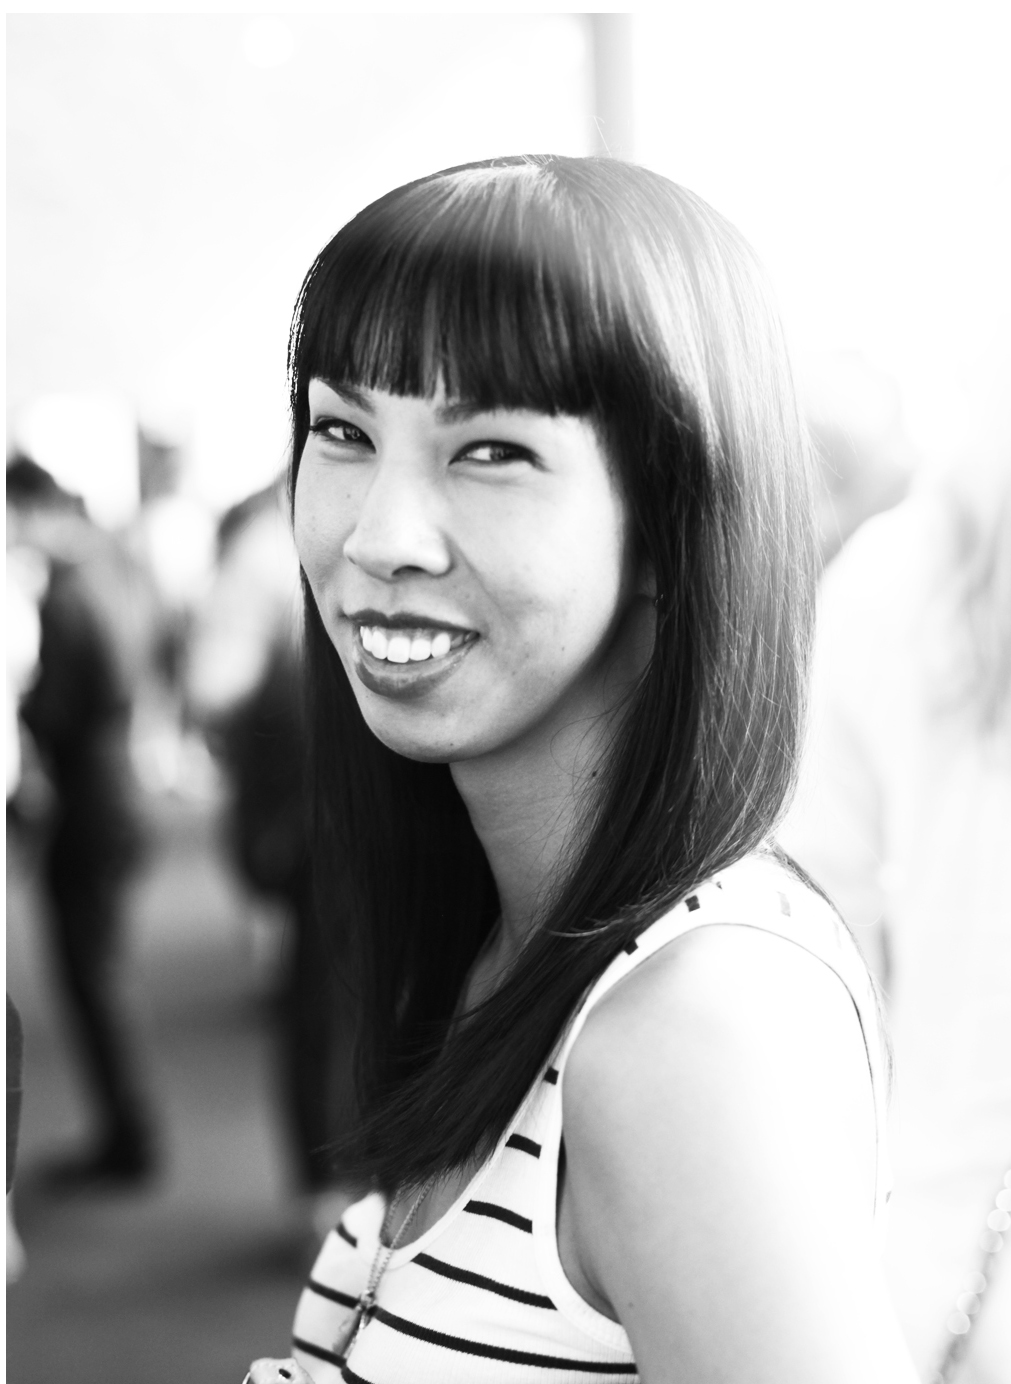 Kimberly Lyn - Profile.jpg